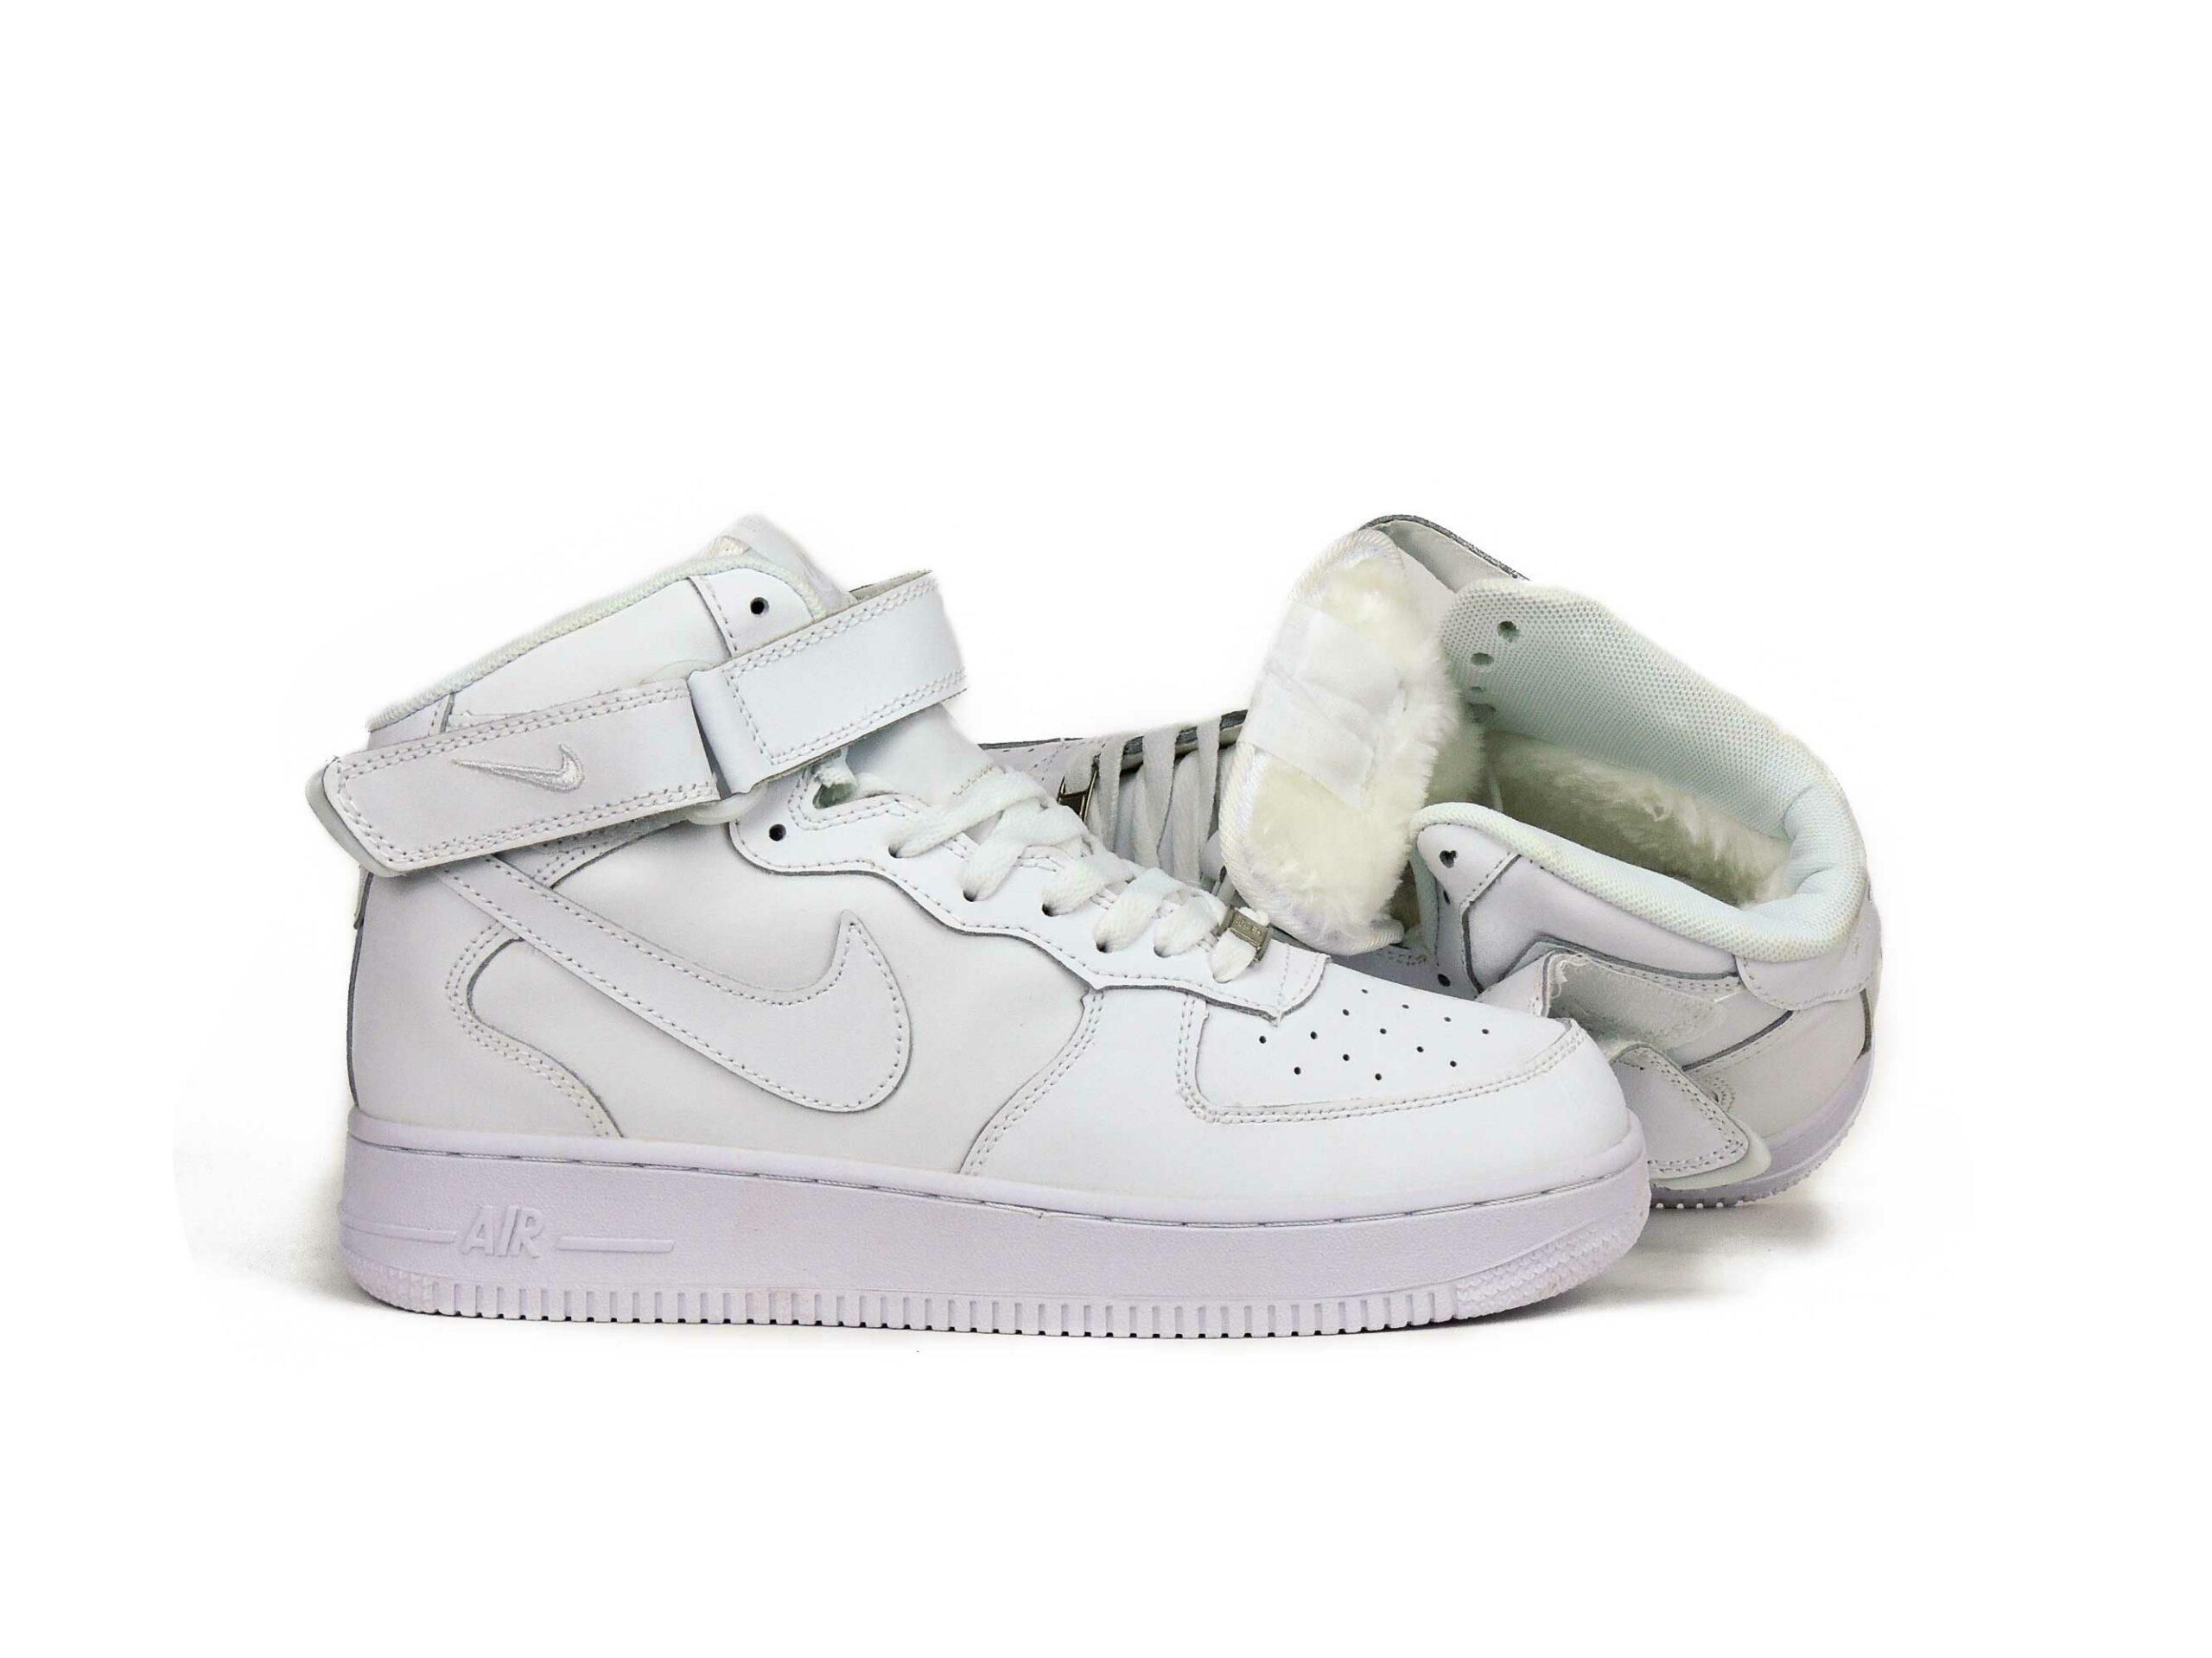 nike air force 1 white mid winter 334031_611 купить